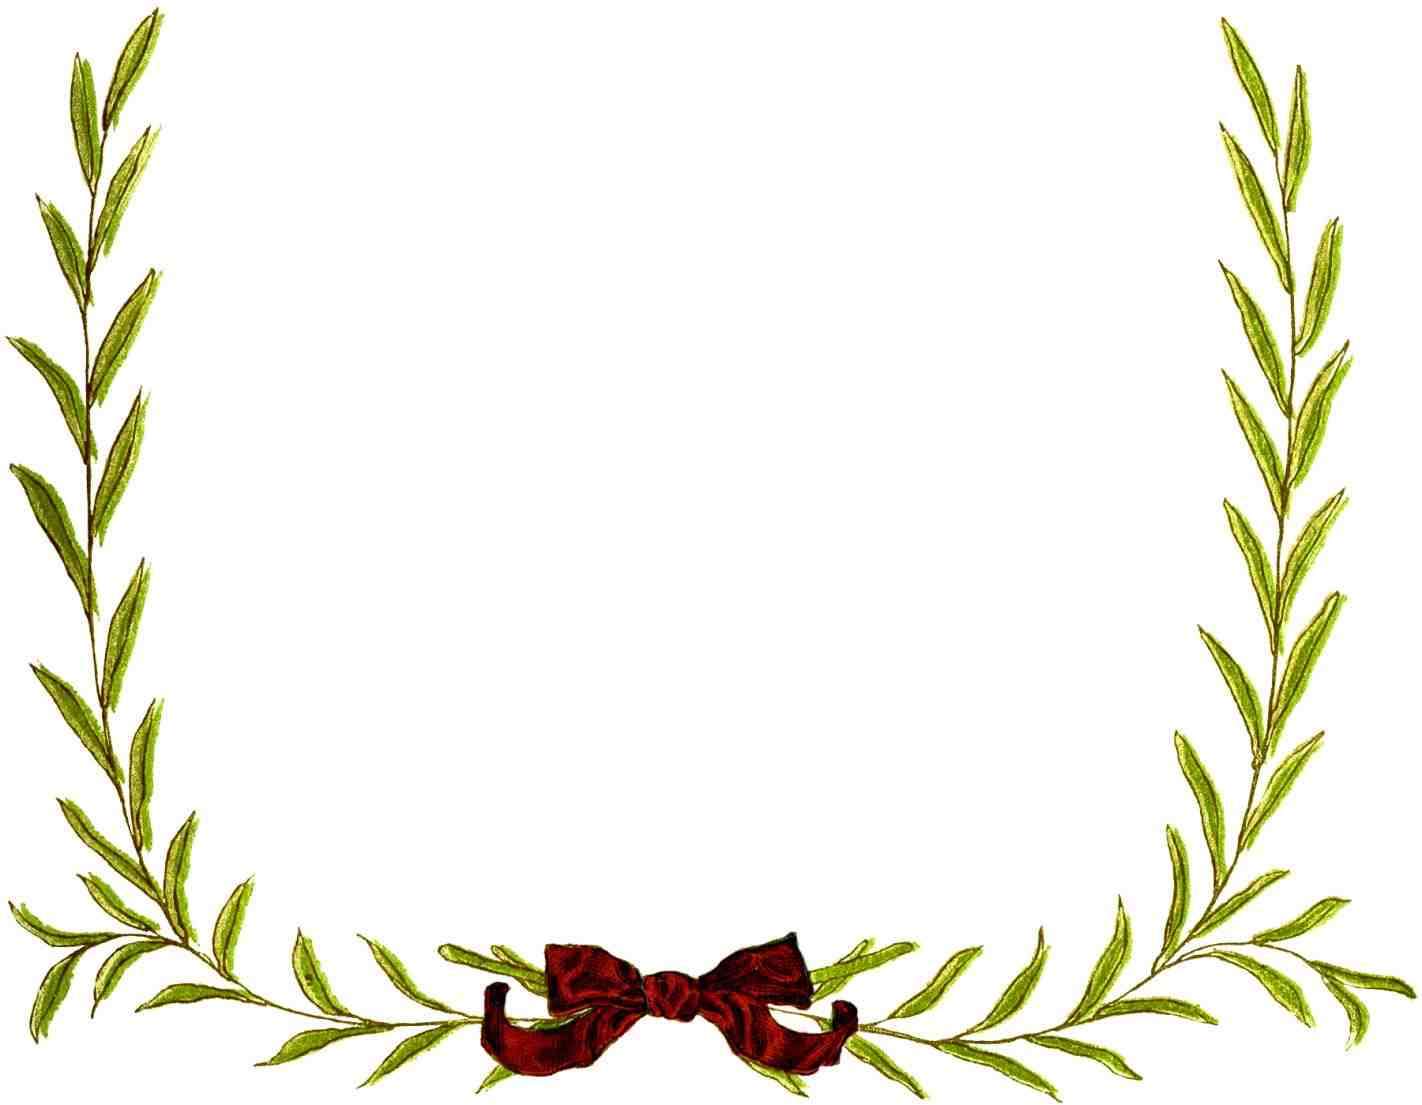 1422x1105 Simple Christmas Frame Cheminee.website